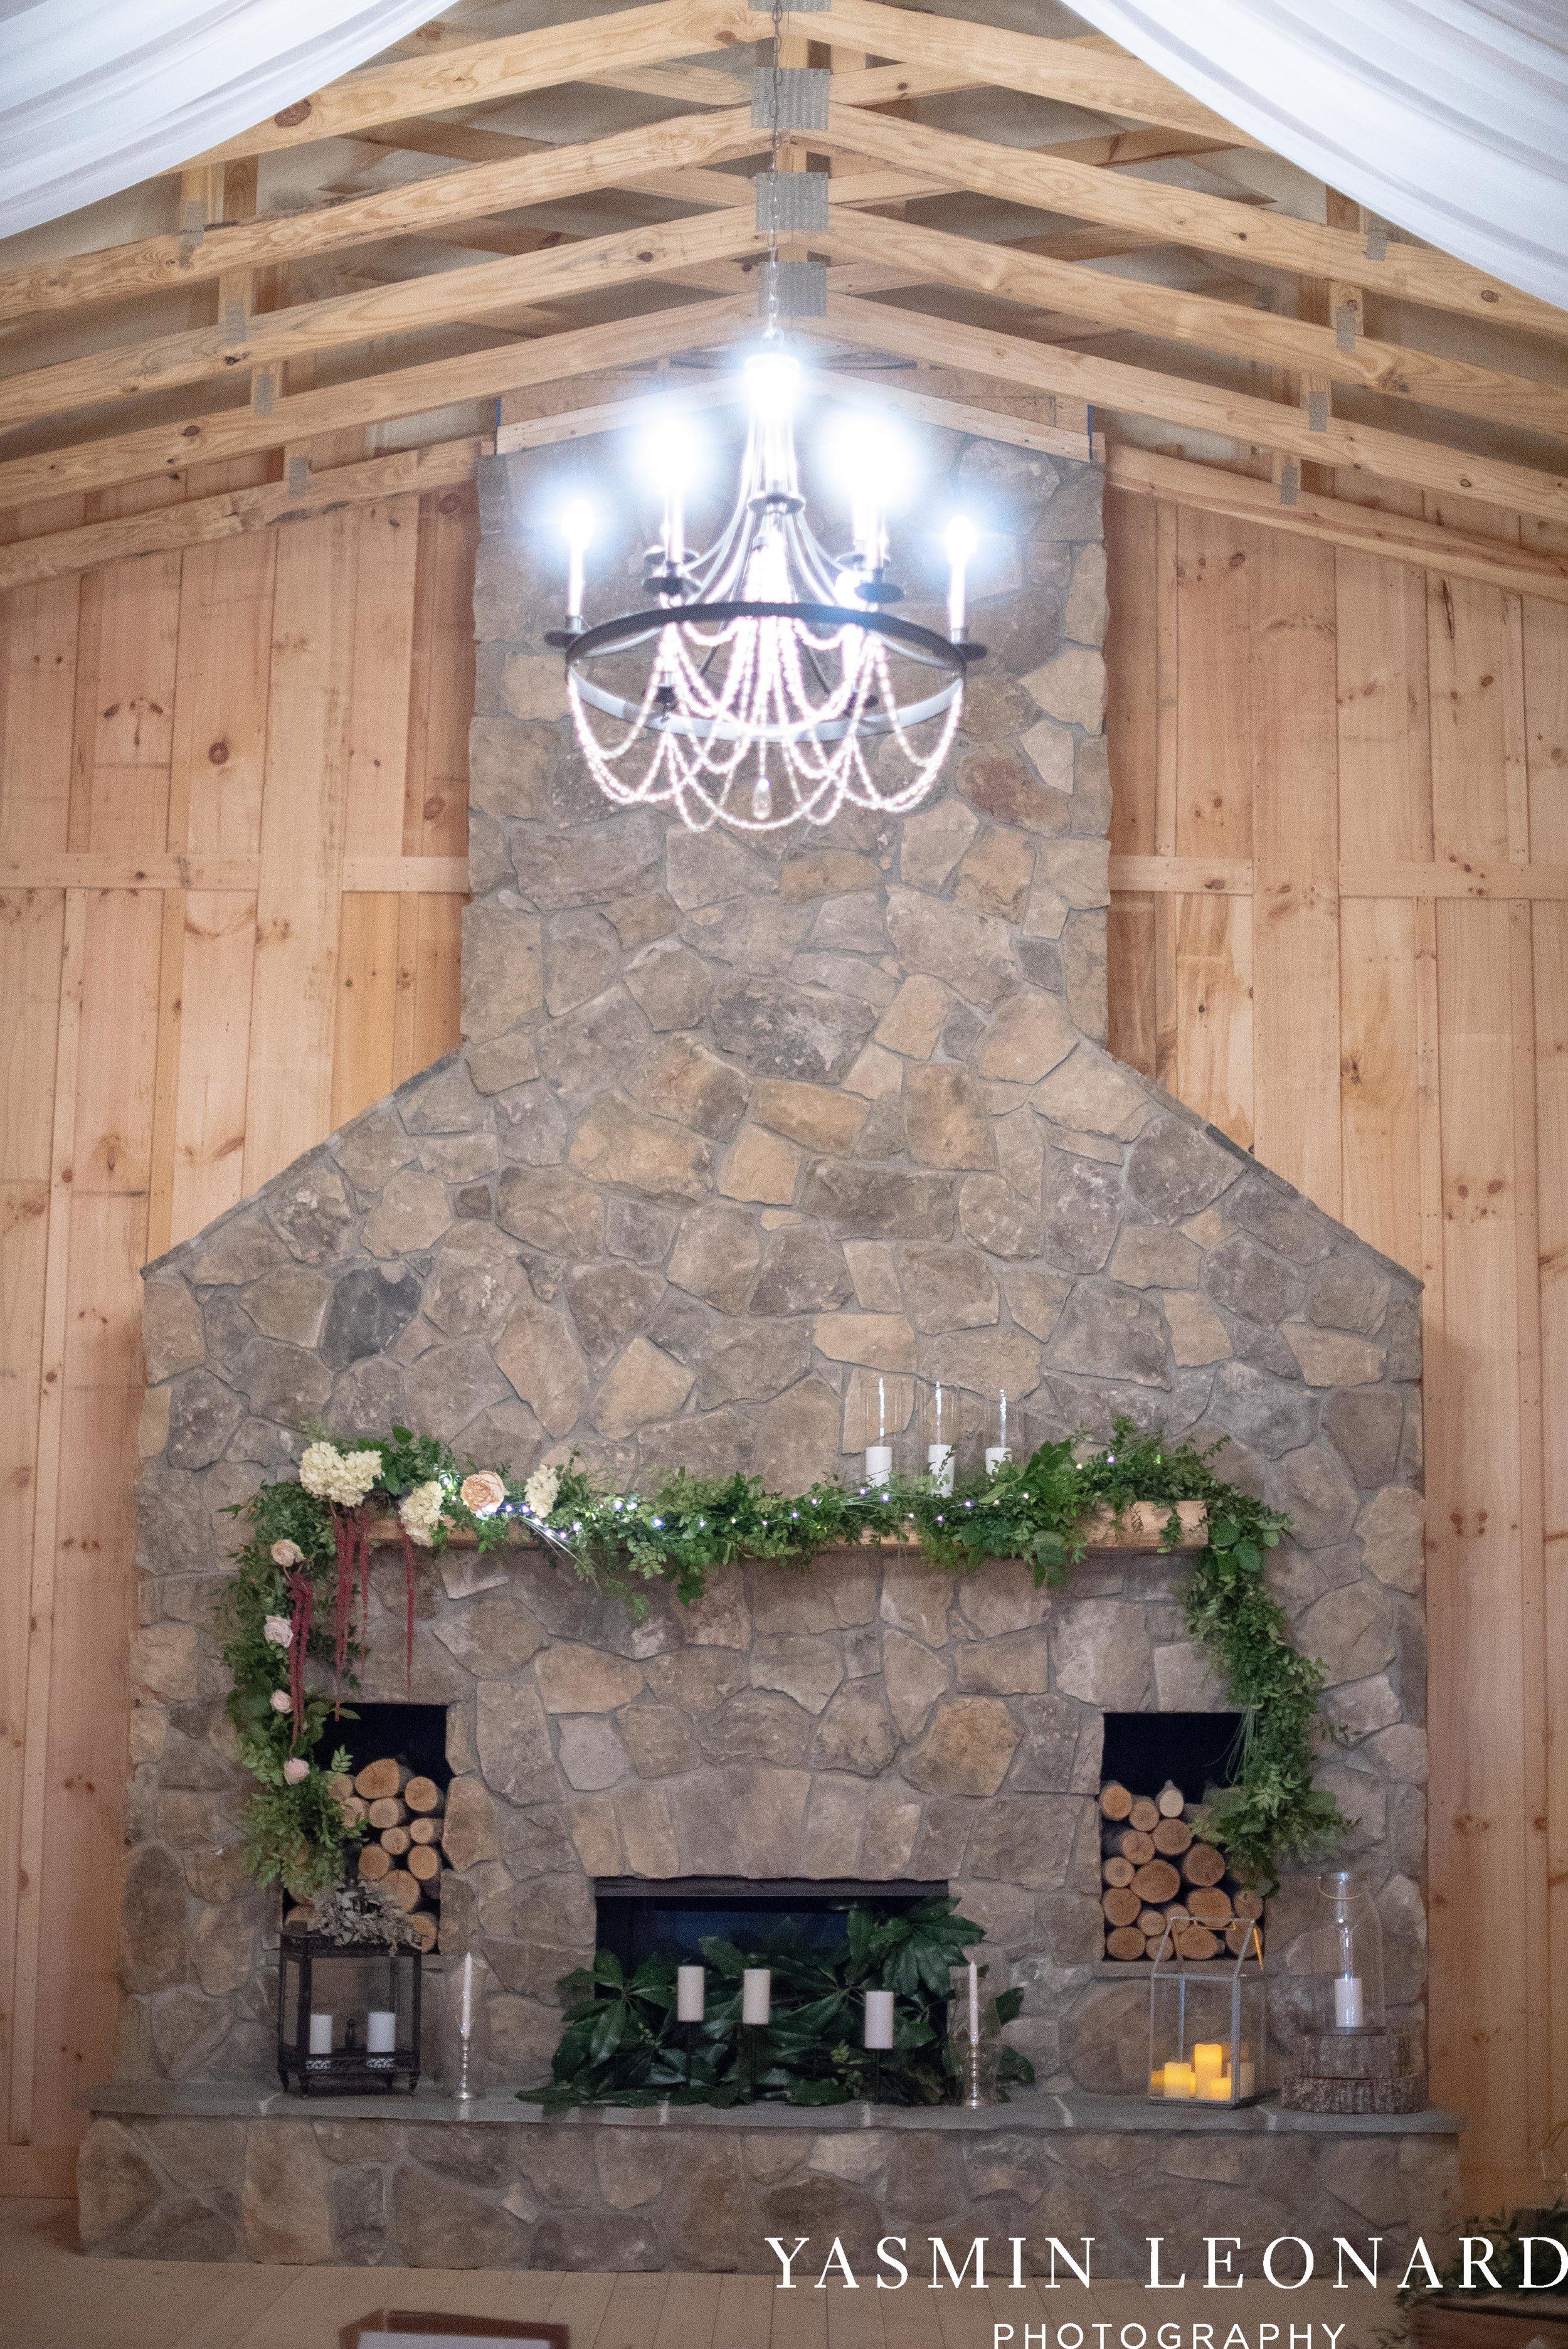 Wesley Memorial United Methodist Church - Old Homeplace Winery - High Point Weddings - High Point Wedding Photographer - NC Weddings - NC Barn Venue - Yasmin Leonard Photography-43.jpg